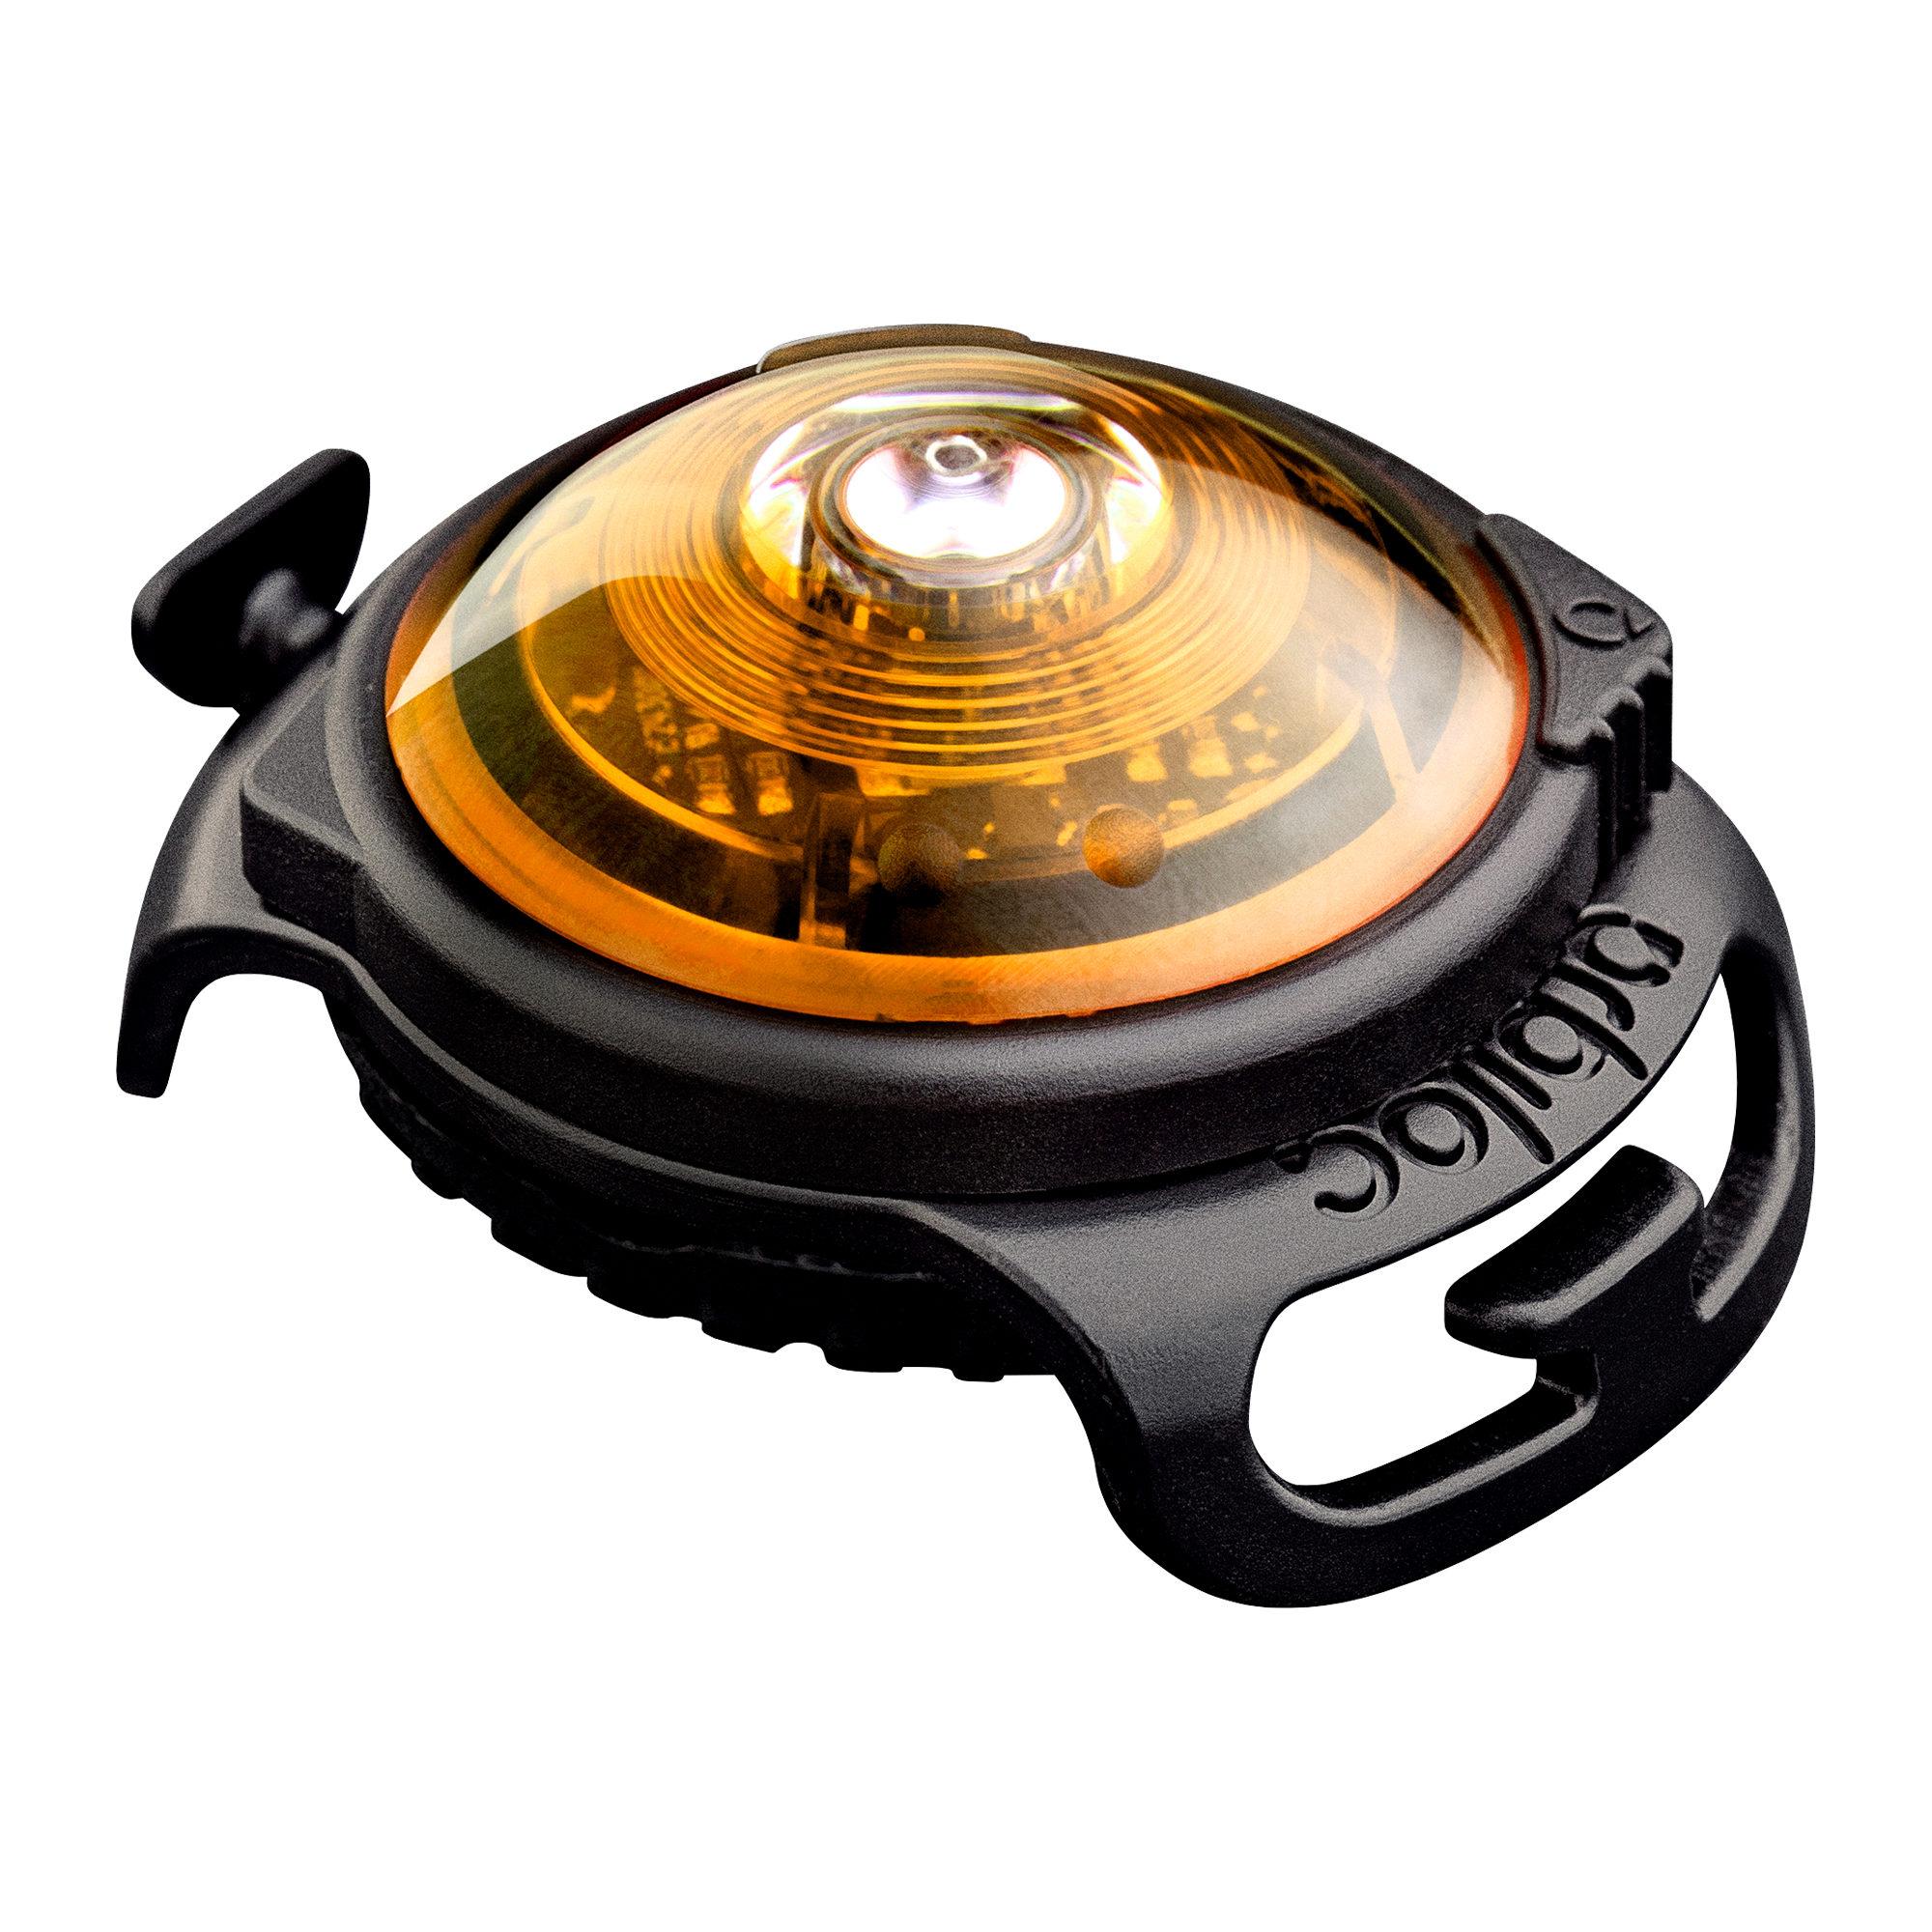 Orbiloc Dog Dual Safety Light - Jaune